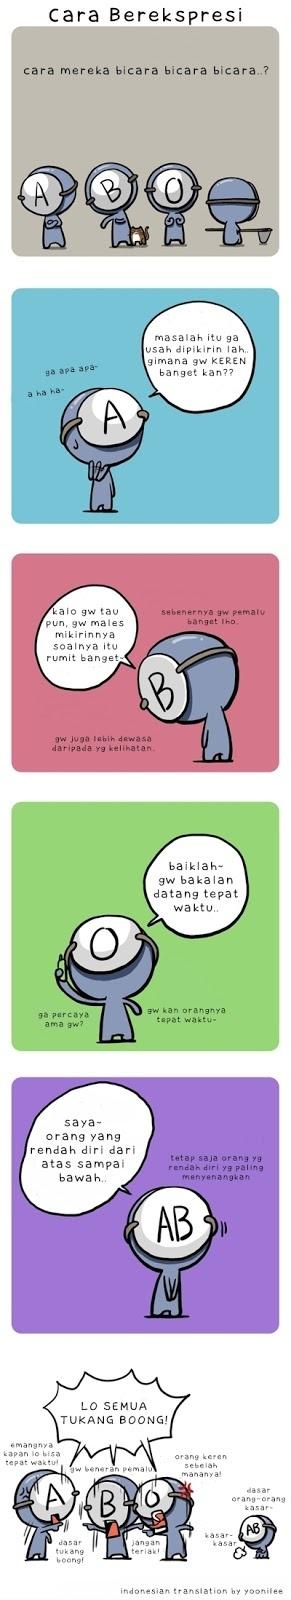 Cara Berekspresi